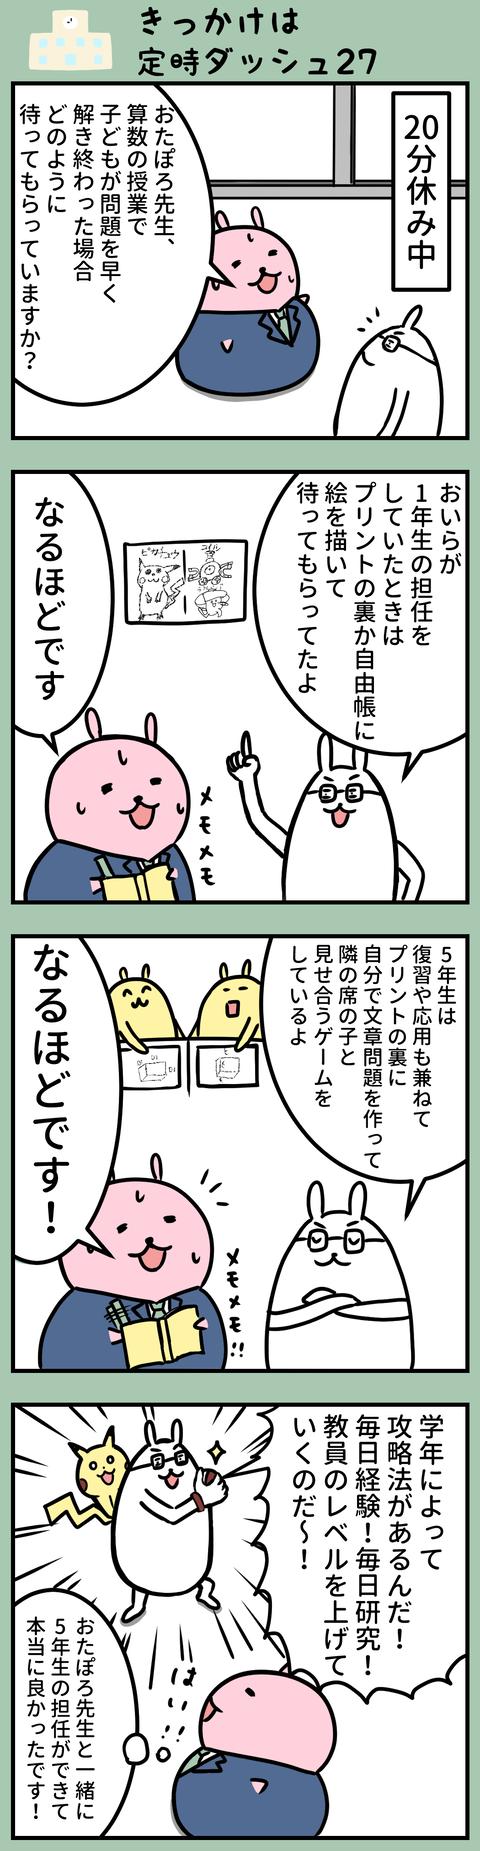 manga-yuzuporo88-1